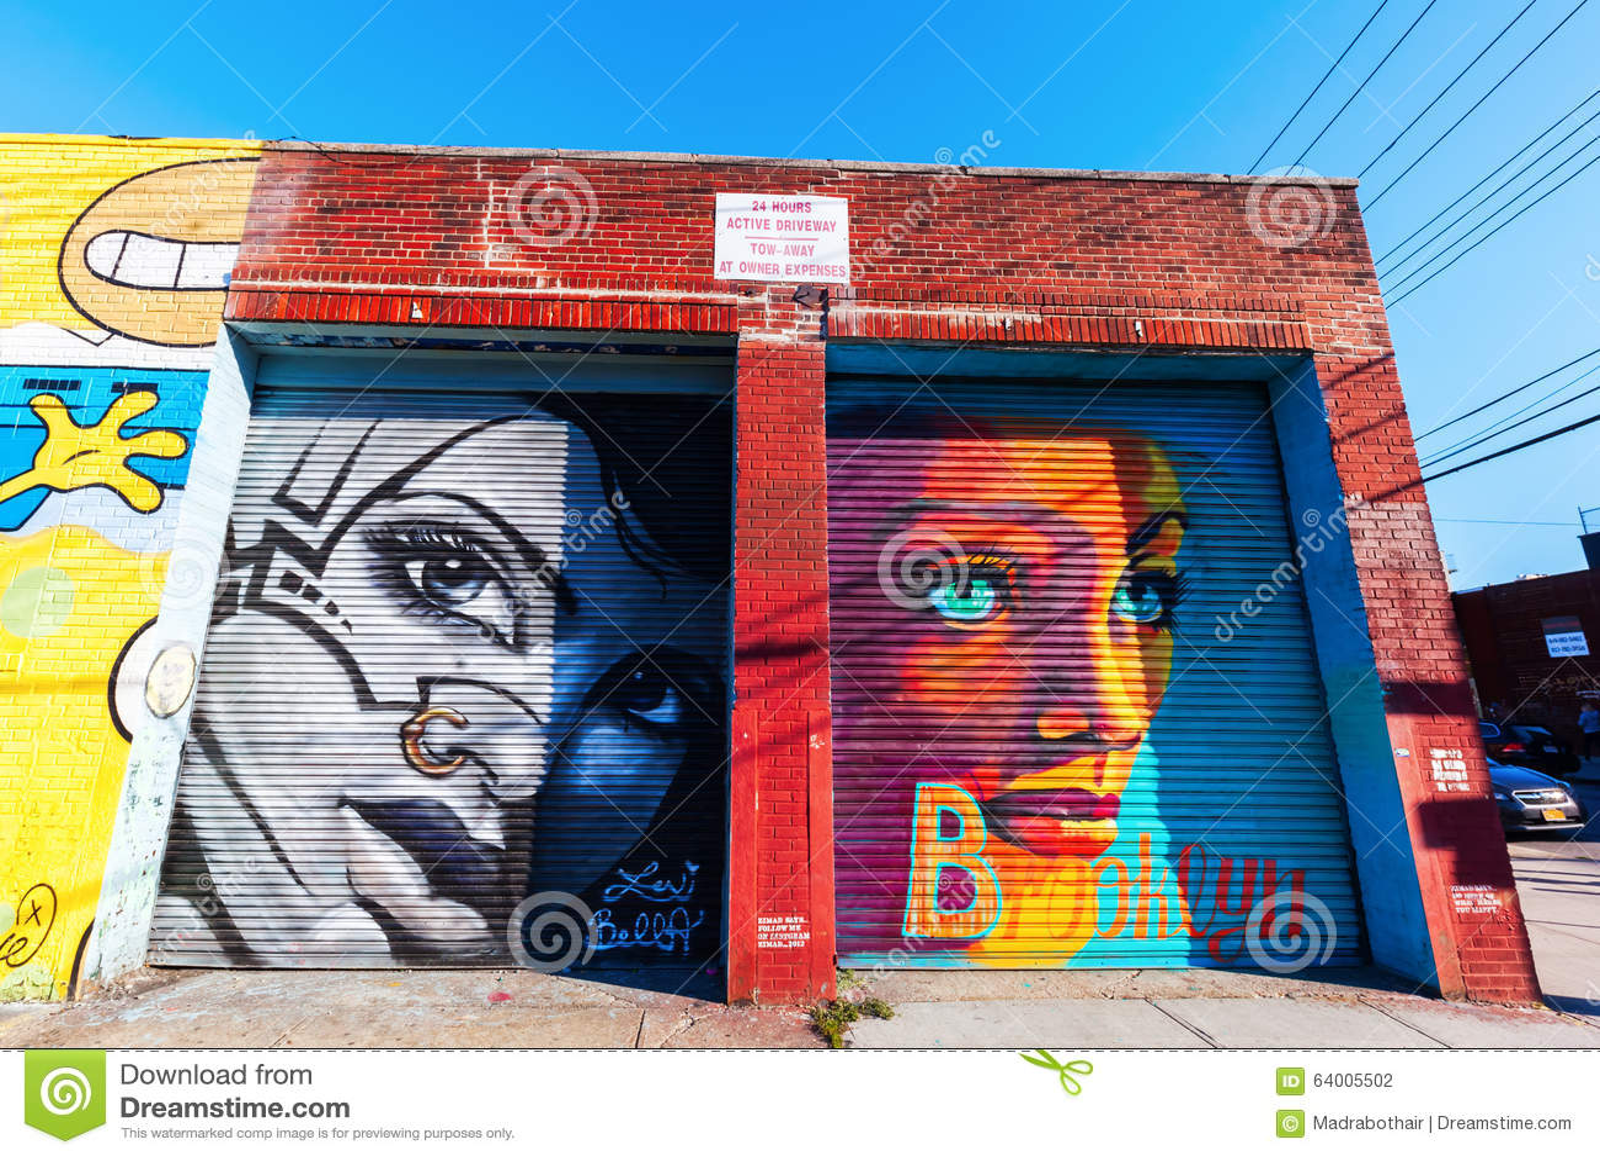 Mural Art In Bushwick, Brooklyn, NYC Editorial Photography - Image